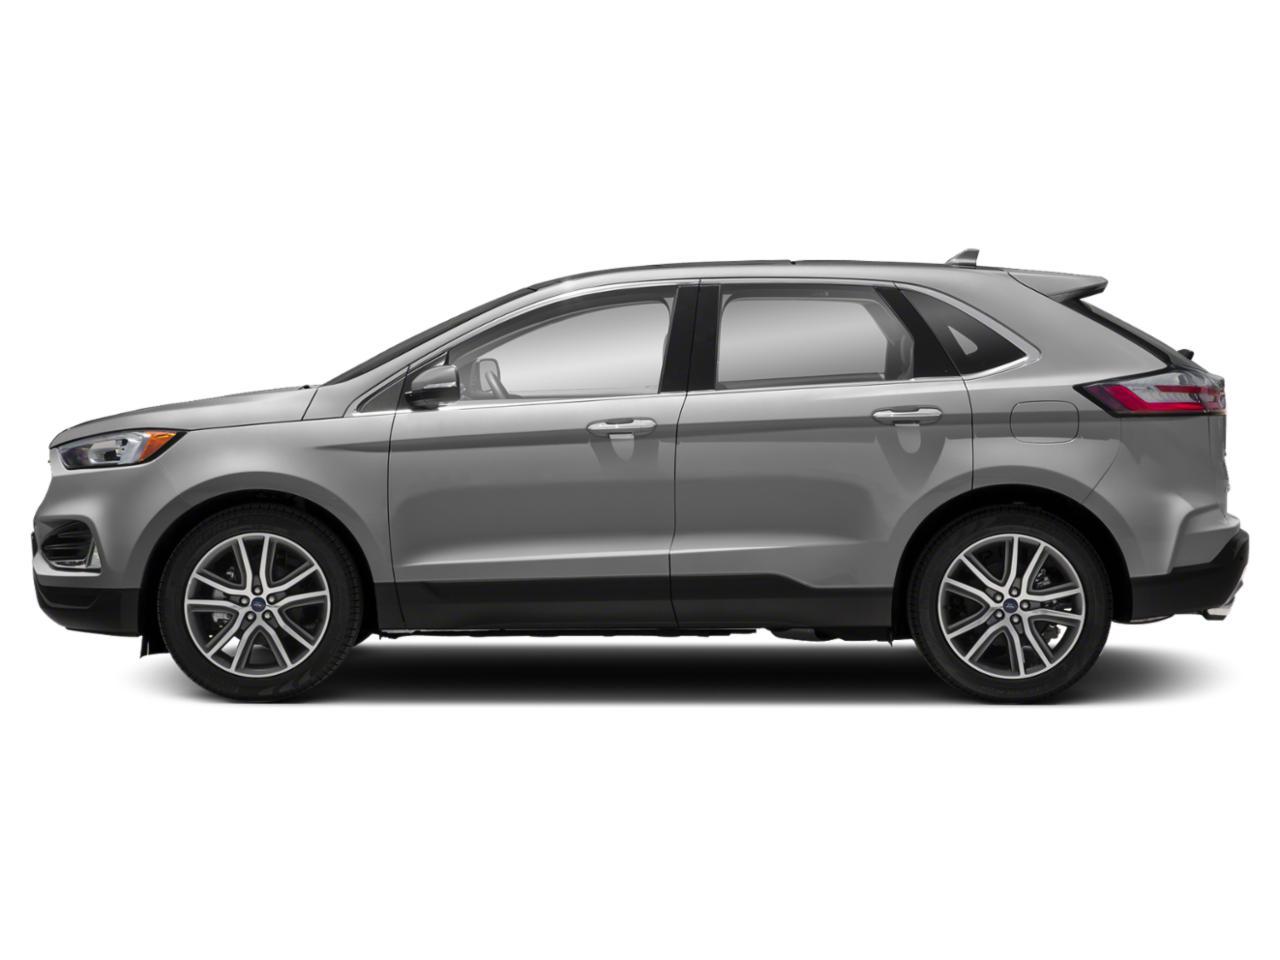 Used 2019 Ford Edge Titanium with VIN 2FMPK4K96KBC18713 for sale in Braham, Minnesota